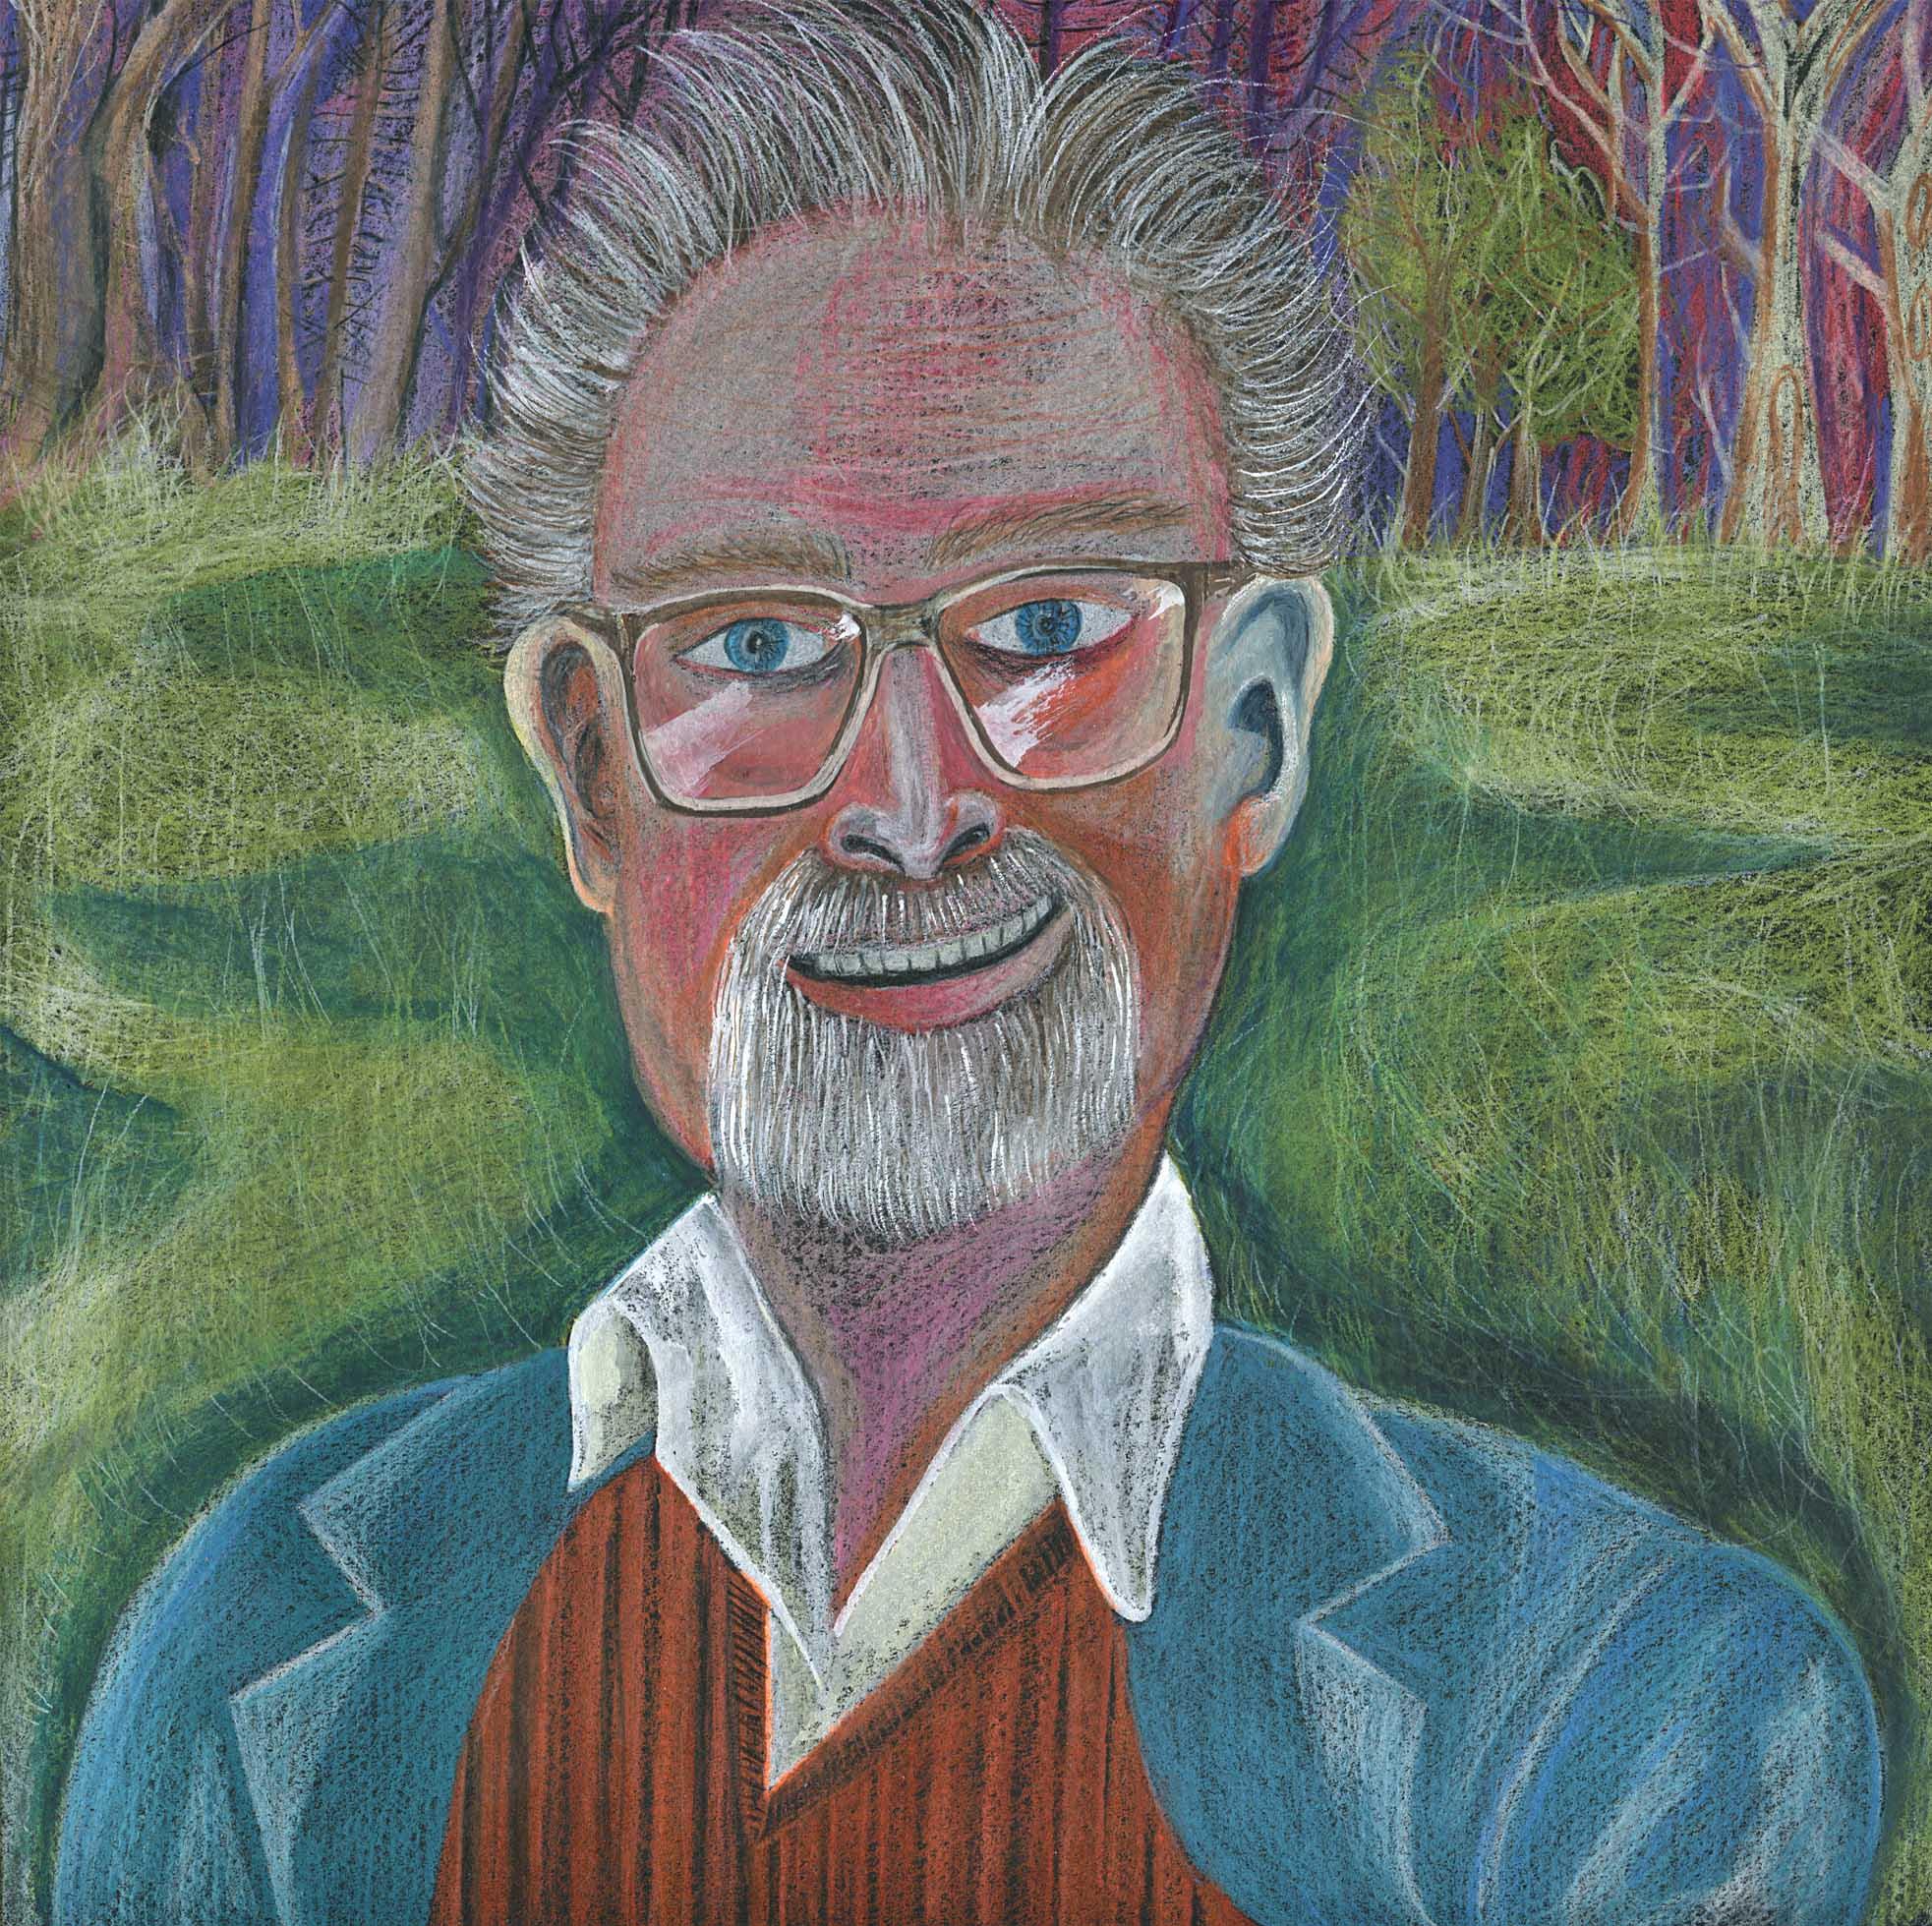 Portrait of Alasdair Gray